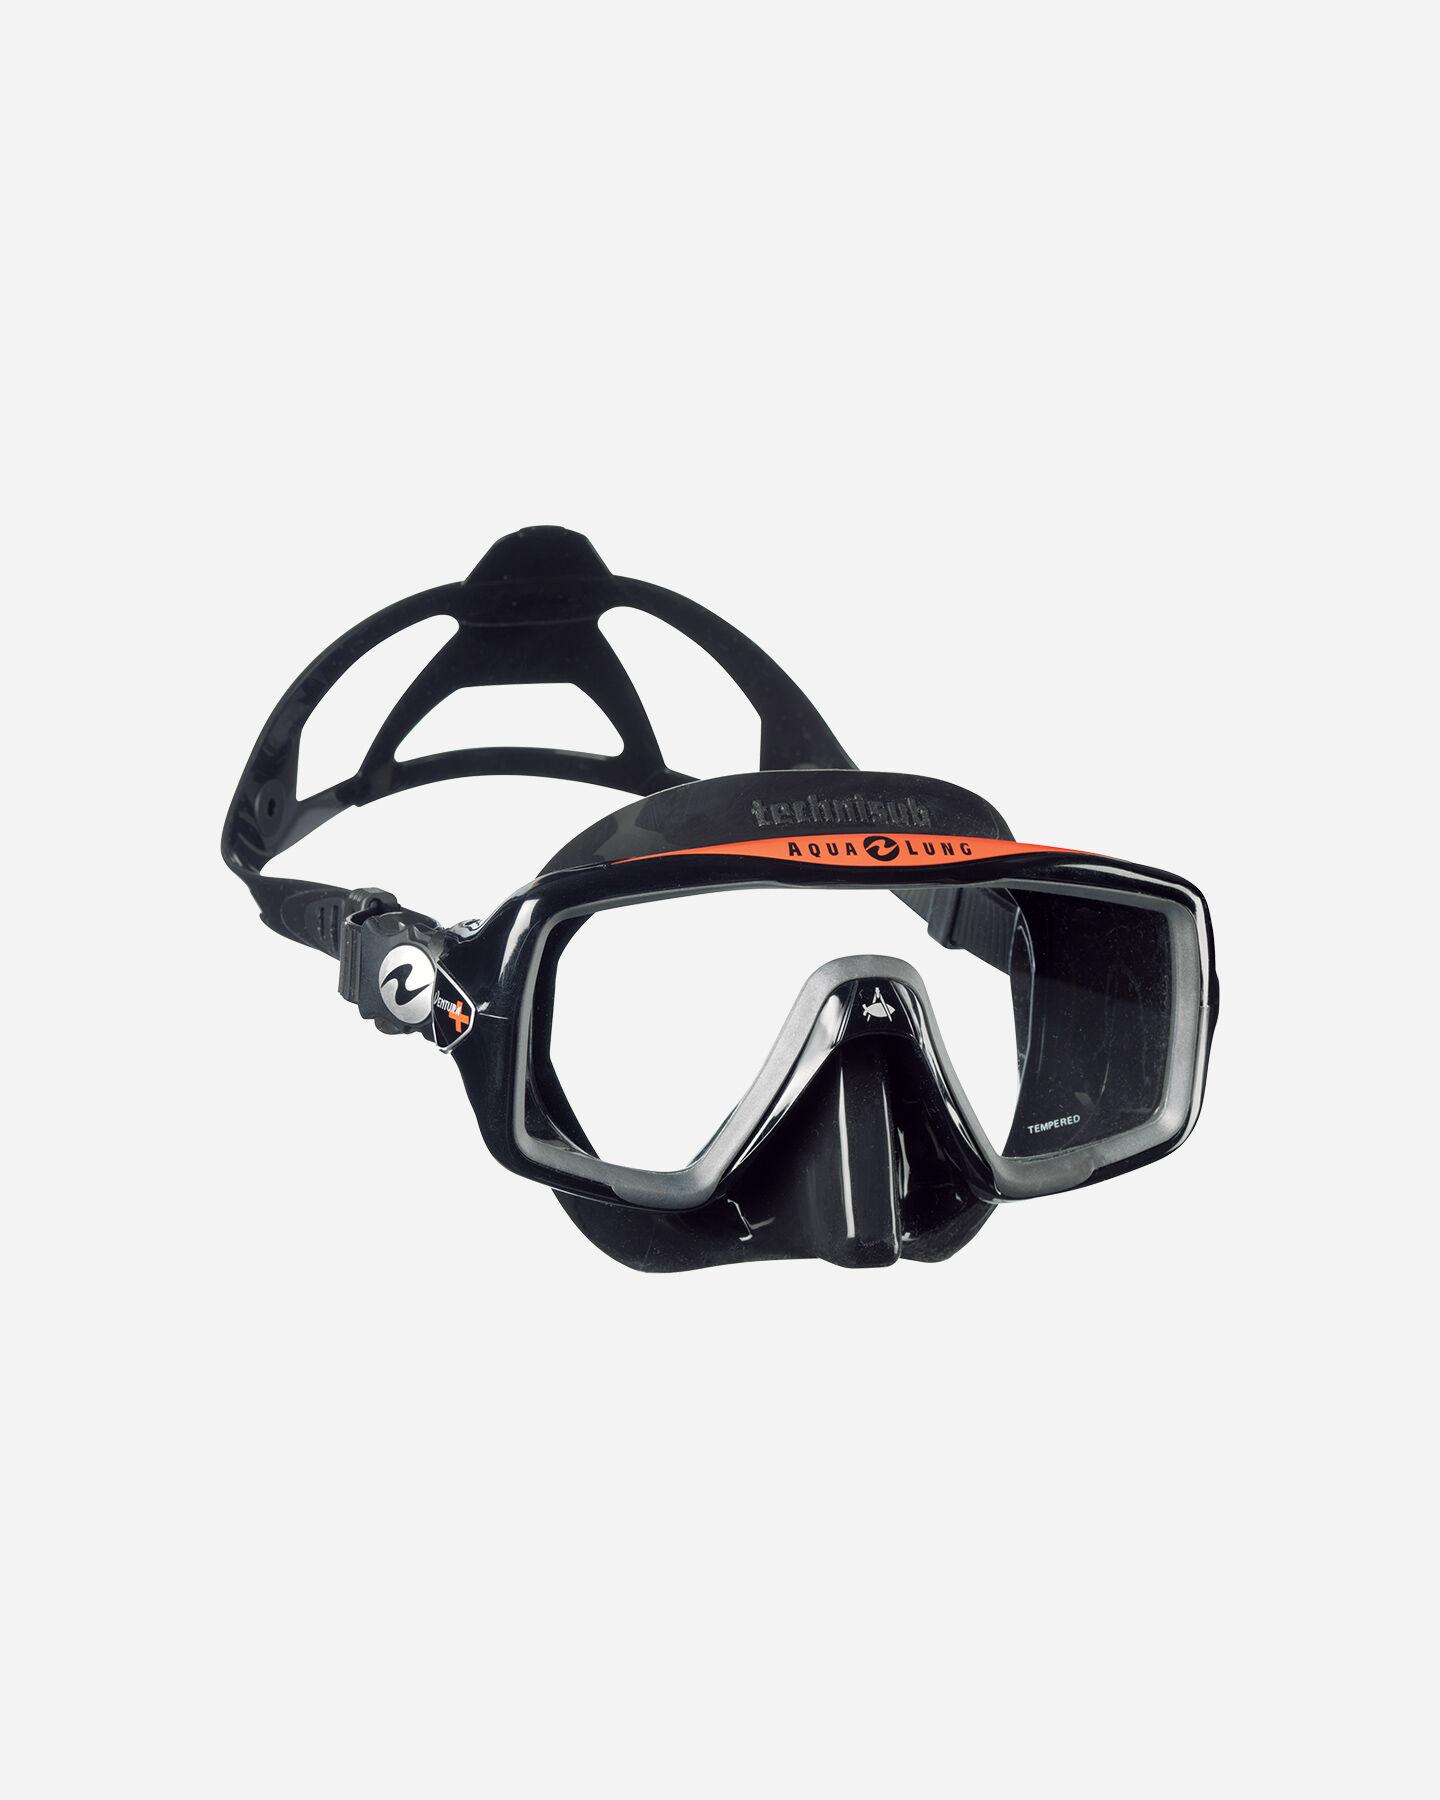 Kit snorkeling AQUALUNG SPORT VENTURA+ S1237300|101|UNI scatto 1